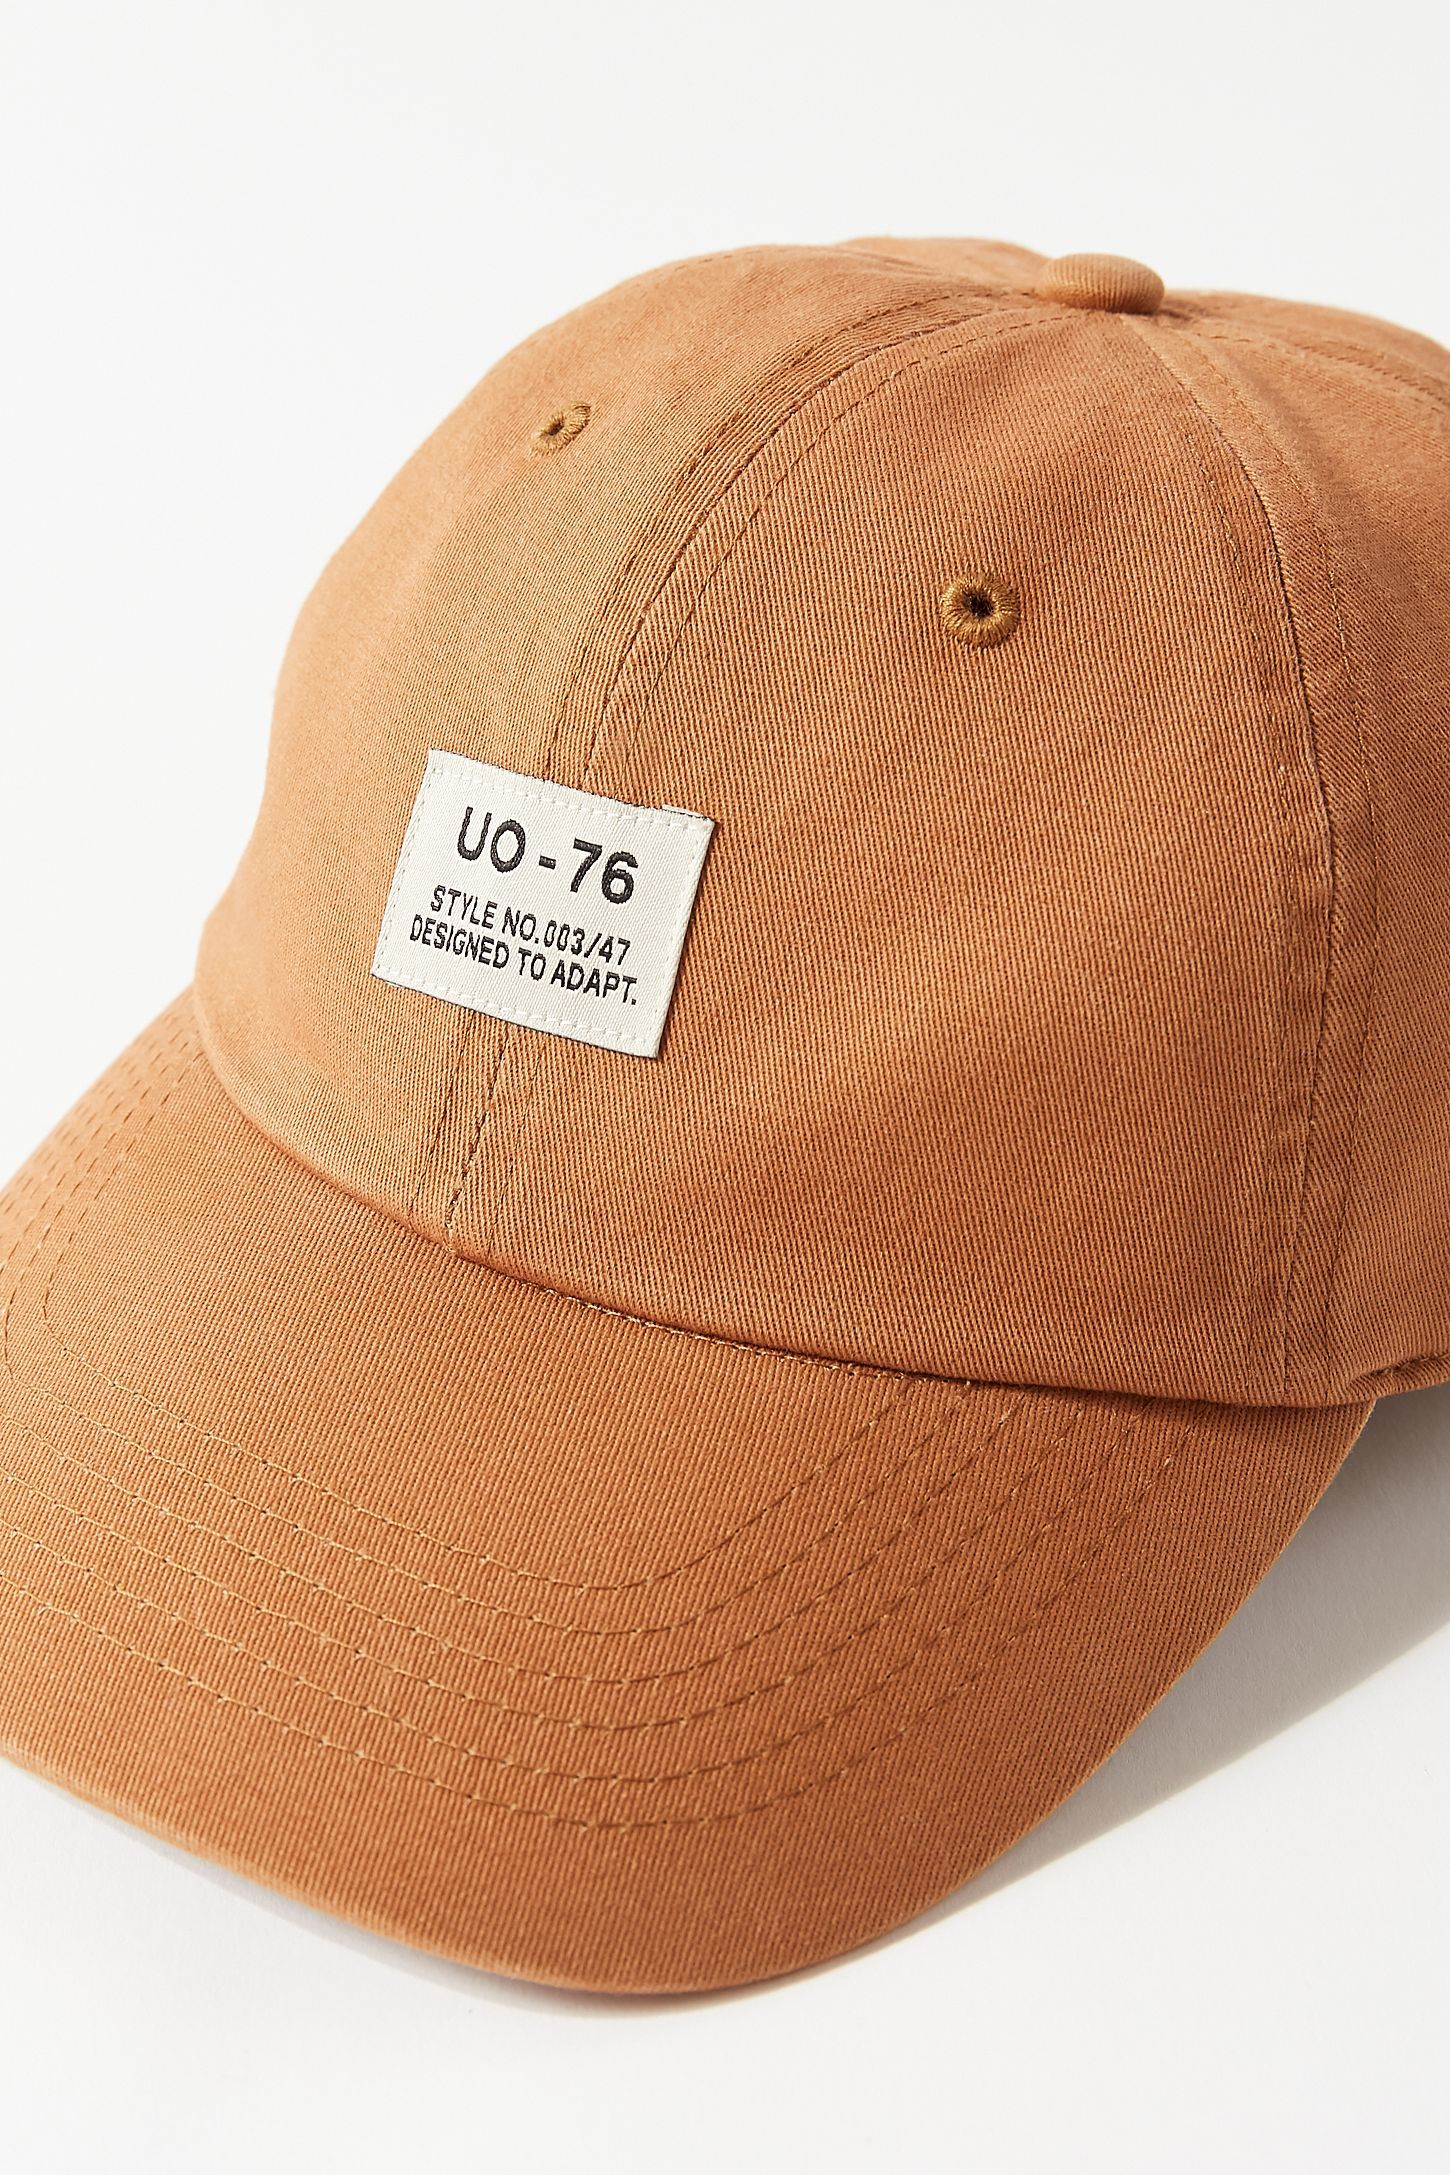 Uo Utility Baseball Hat Urban Outfitters Baseball Hats Fashion Design Moodboard Beach Bag Essentials